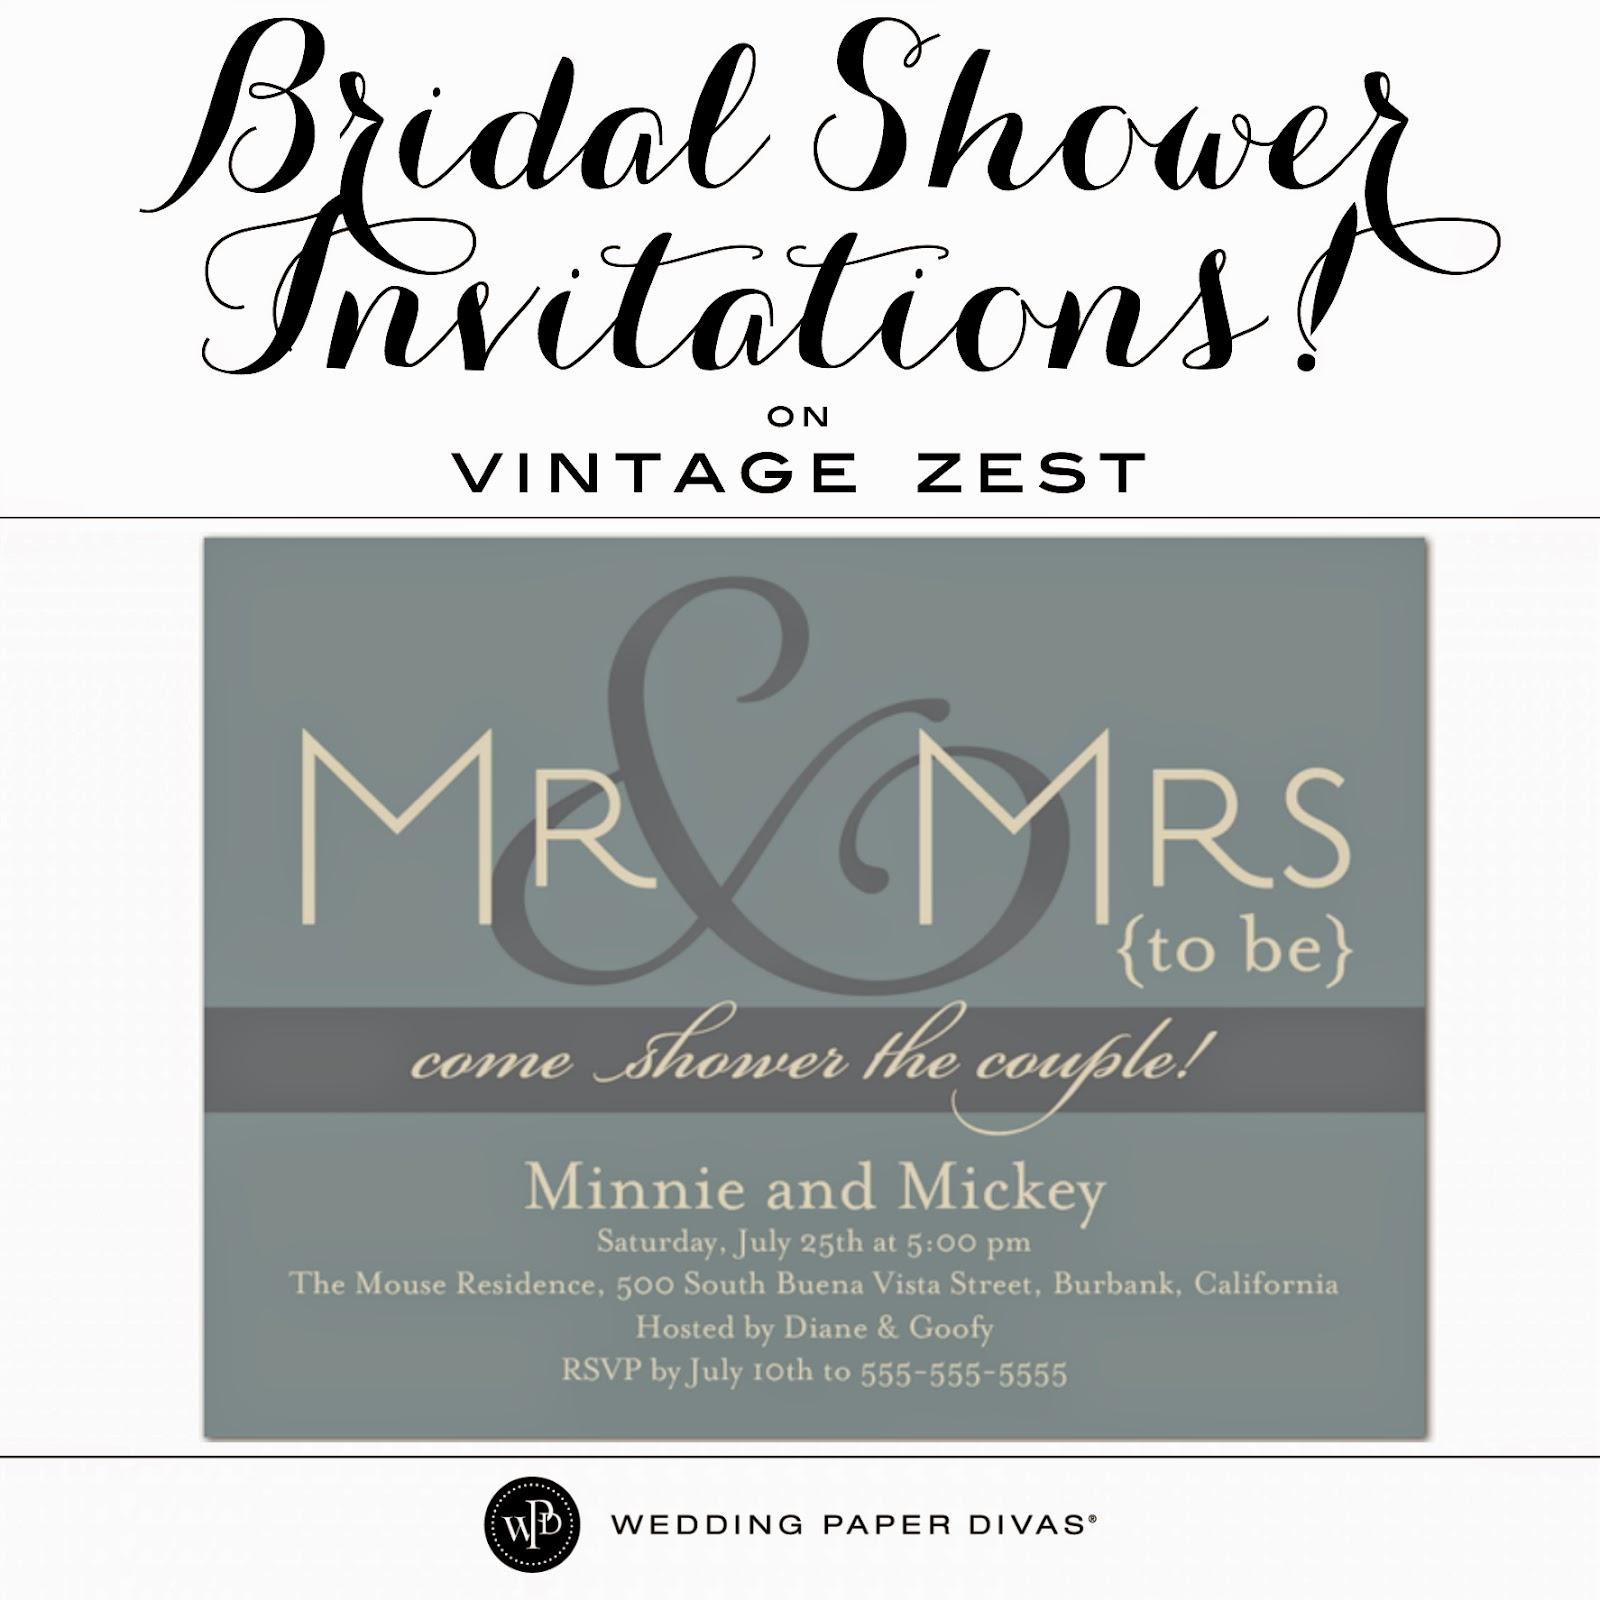 Diane\'s Vintage Zest!: Bridal Shower Invitations with Wedding ...